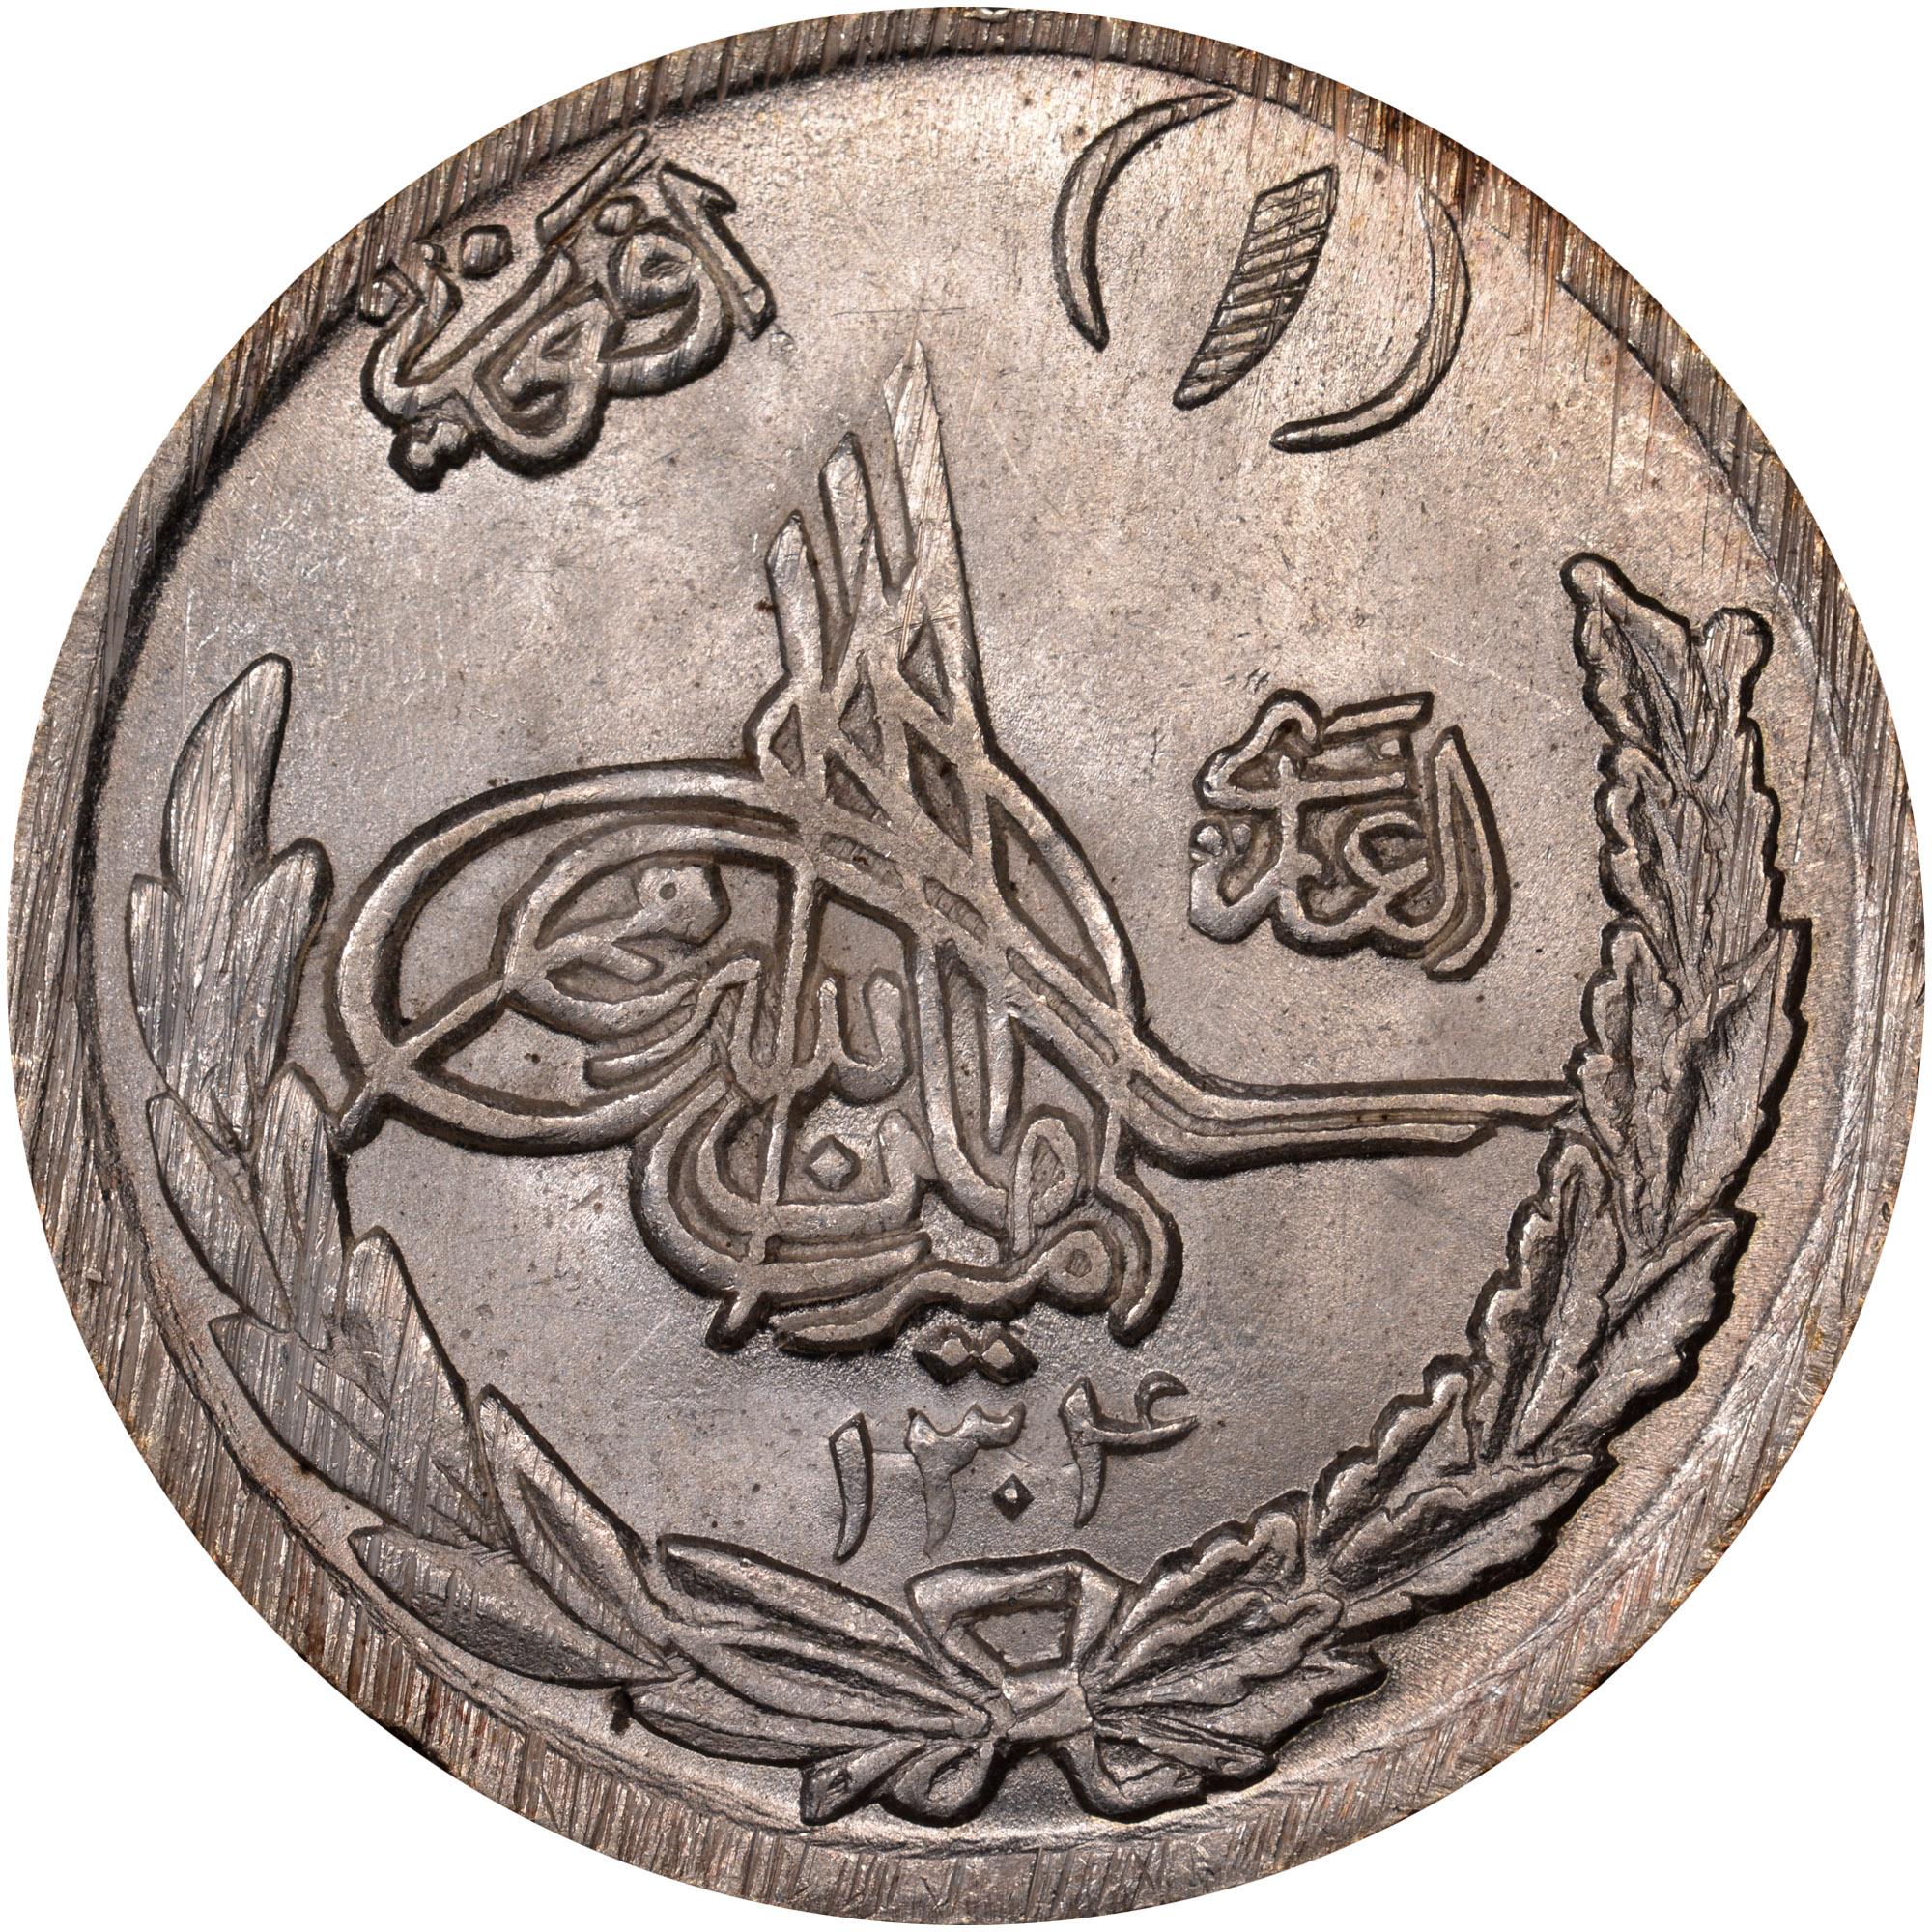 1304/7-1306/9 Afghanistan Afghani, 100 Pul obverse